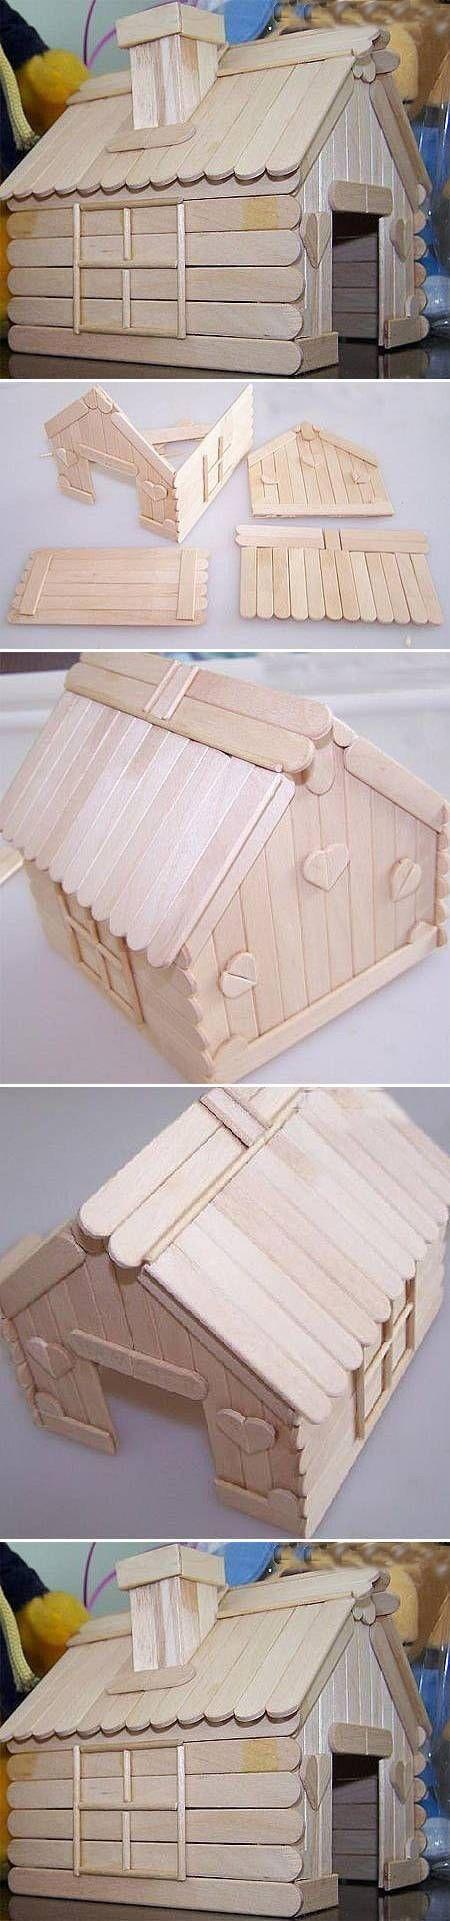 M s de 1000 ideas sobre casa de p jaros de palitos de for Casitas de madera para guardar cosas